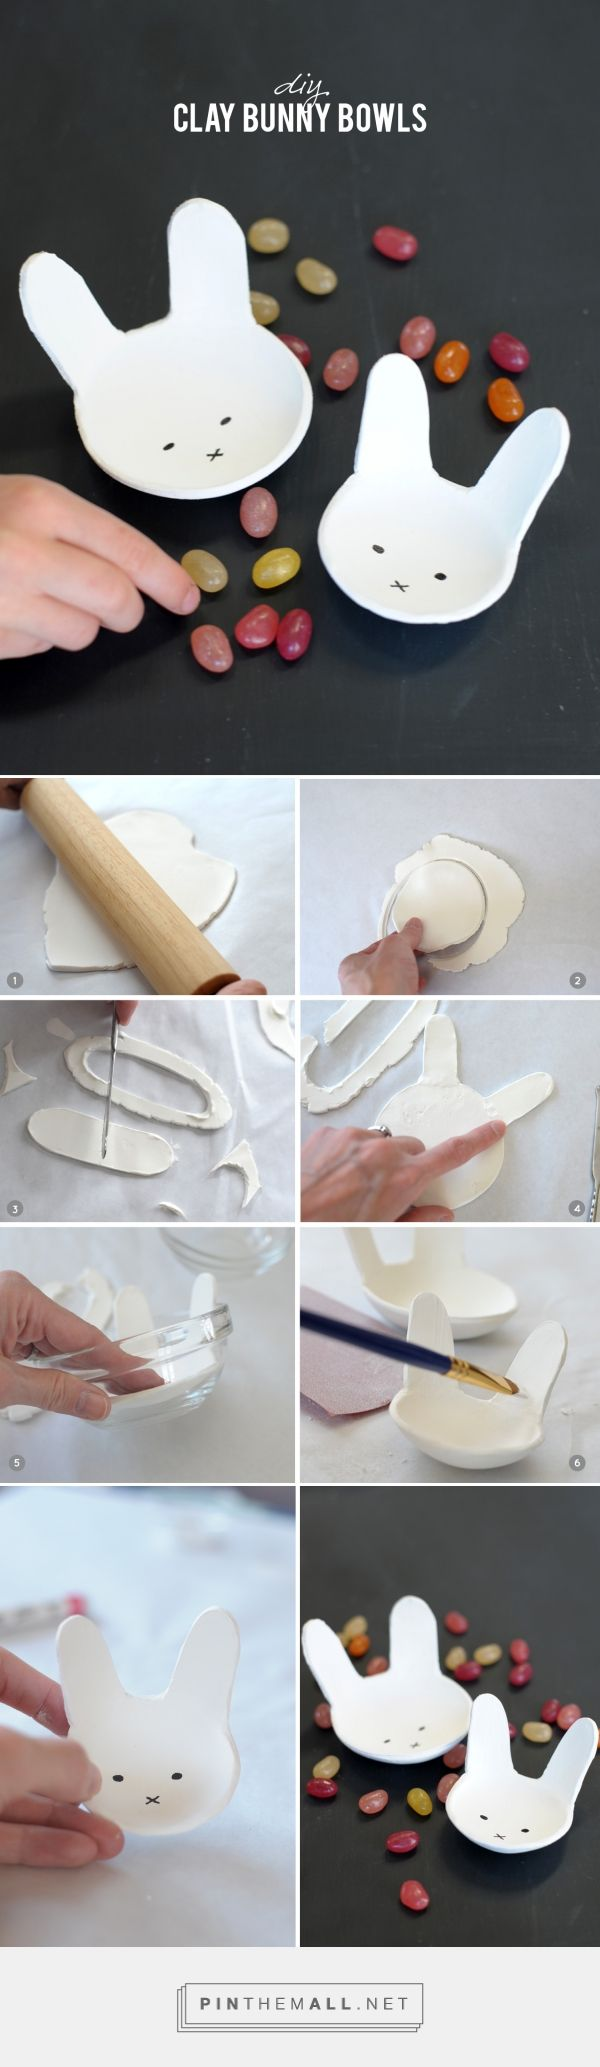 DIY Clay Bunny Bowls - created on 2015-03-26 19:17:36